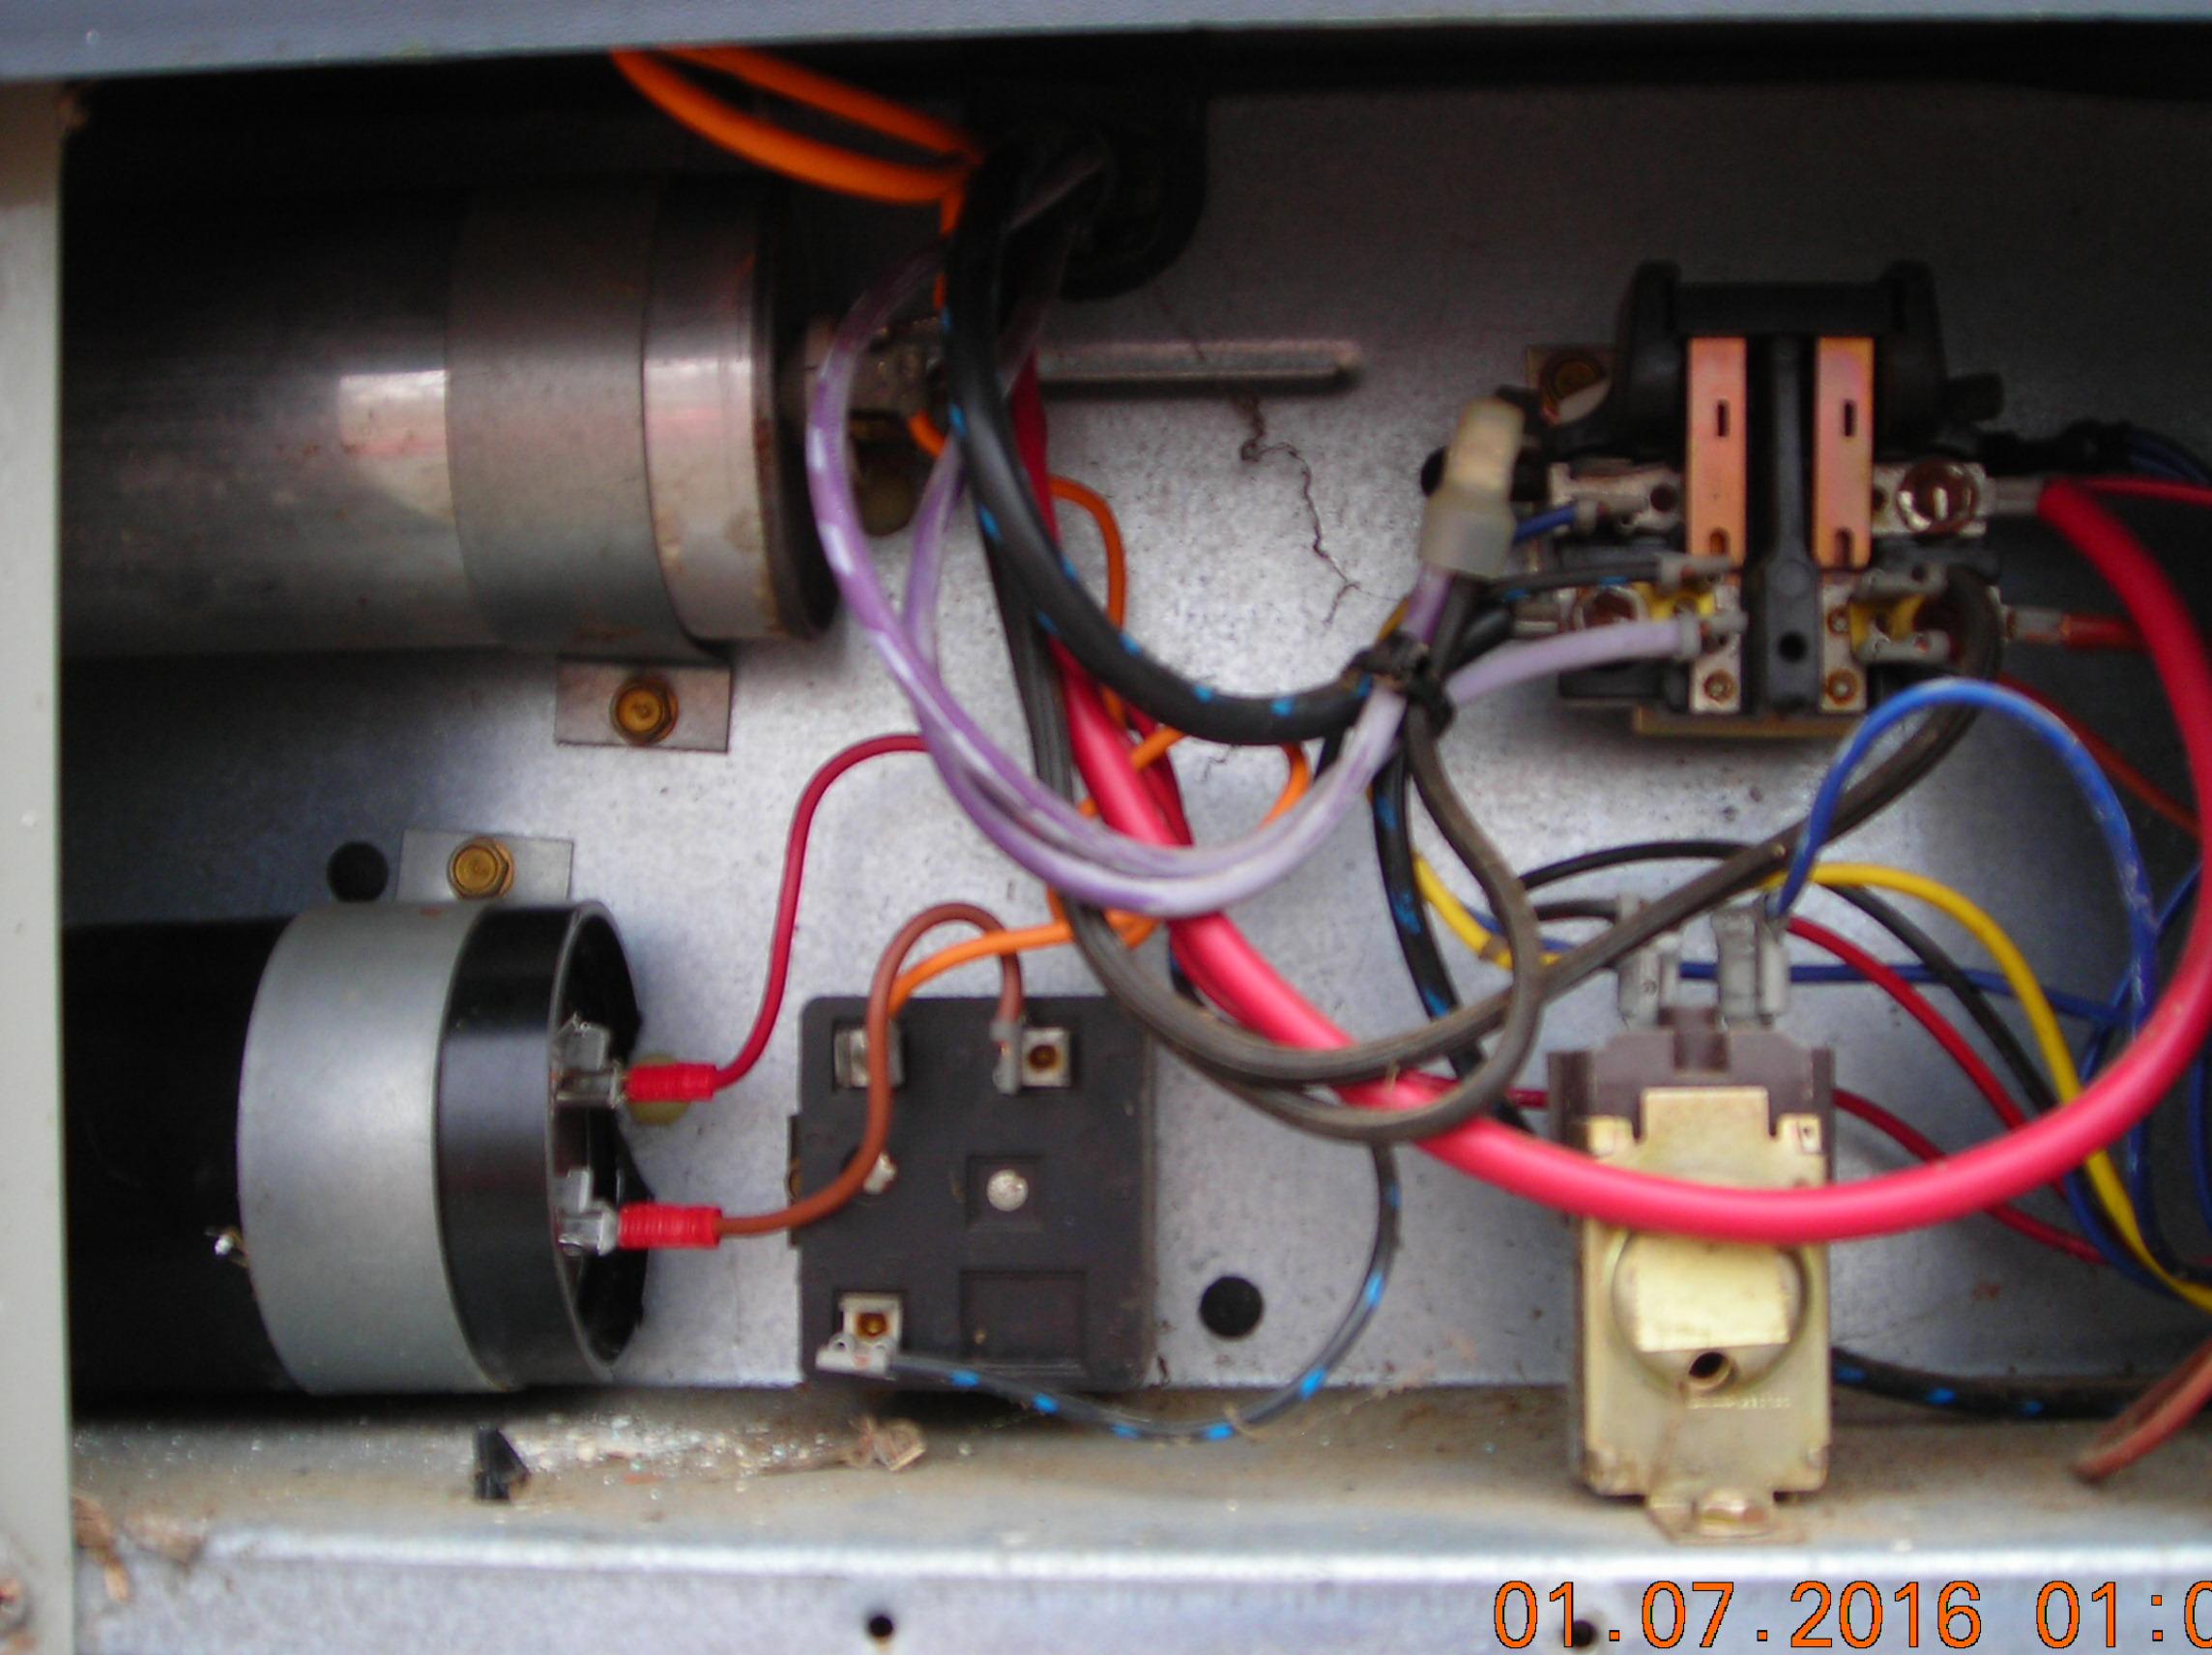 Cowan,I have a Trane XL1200 Model TWX736B100A0 that stopped ... on trane parts diagram, trane xe1000 diagram, 1995 sportster tach wiring diagram, trane heating wiring diagrams, trane condenser wiring-diagram, gas furnace wiring diagram, home furnace wiring diagram, trane xl80 wiring-diagram, trane furnace wiring, bryant 80 wiring diagram,